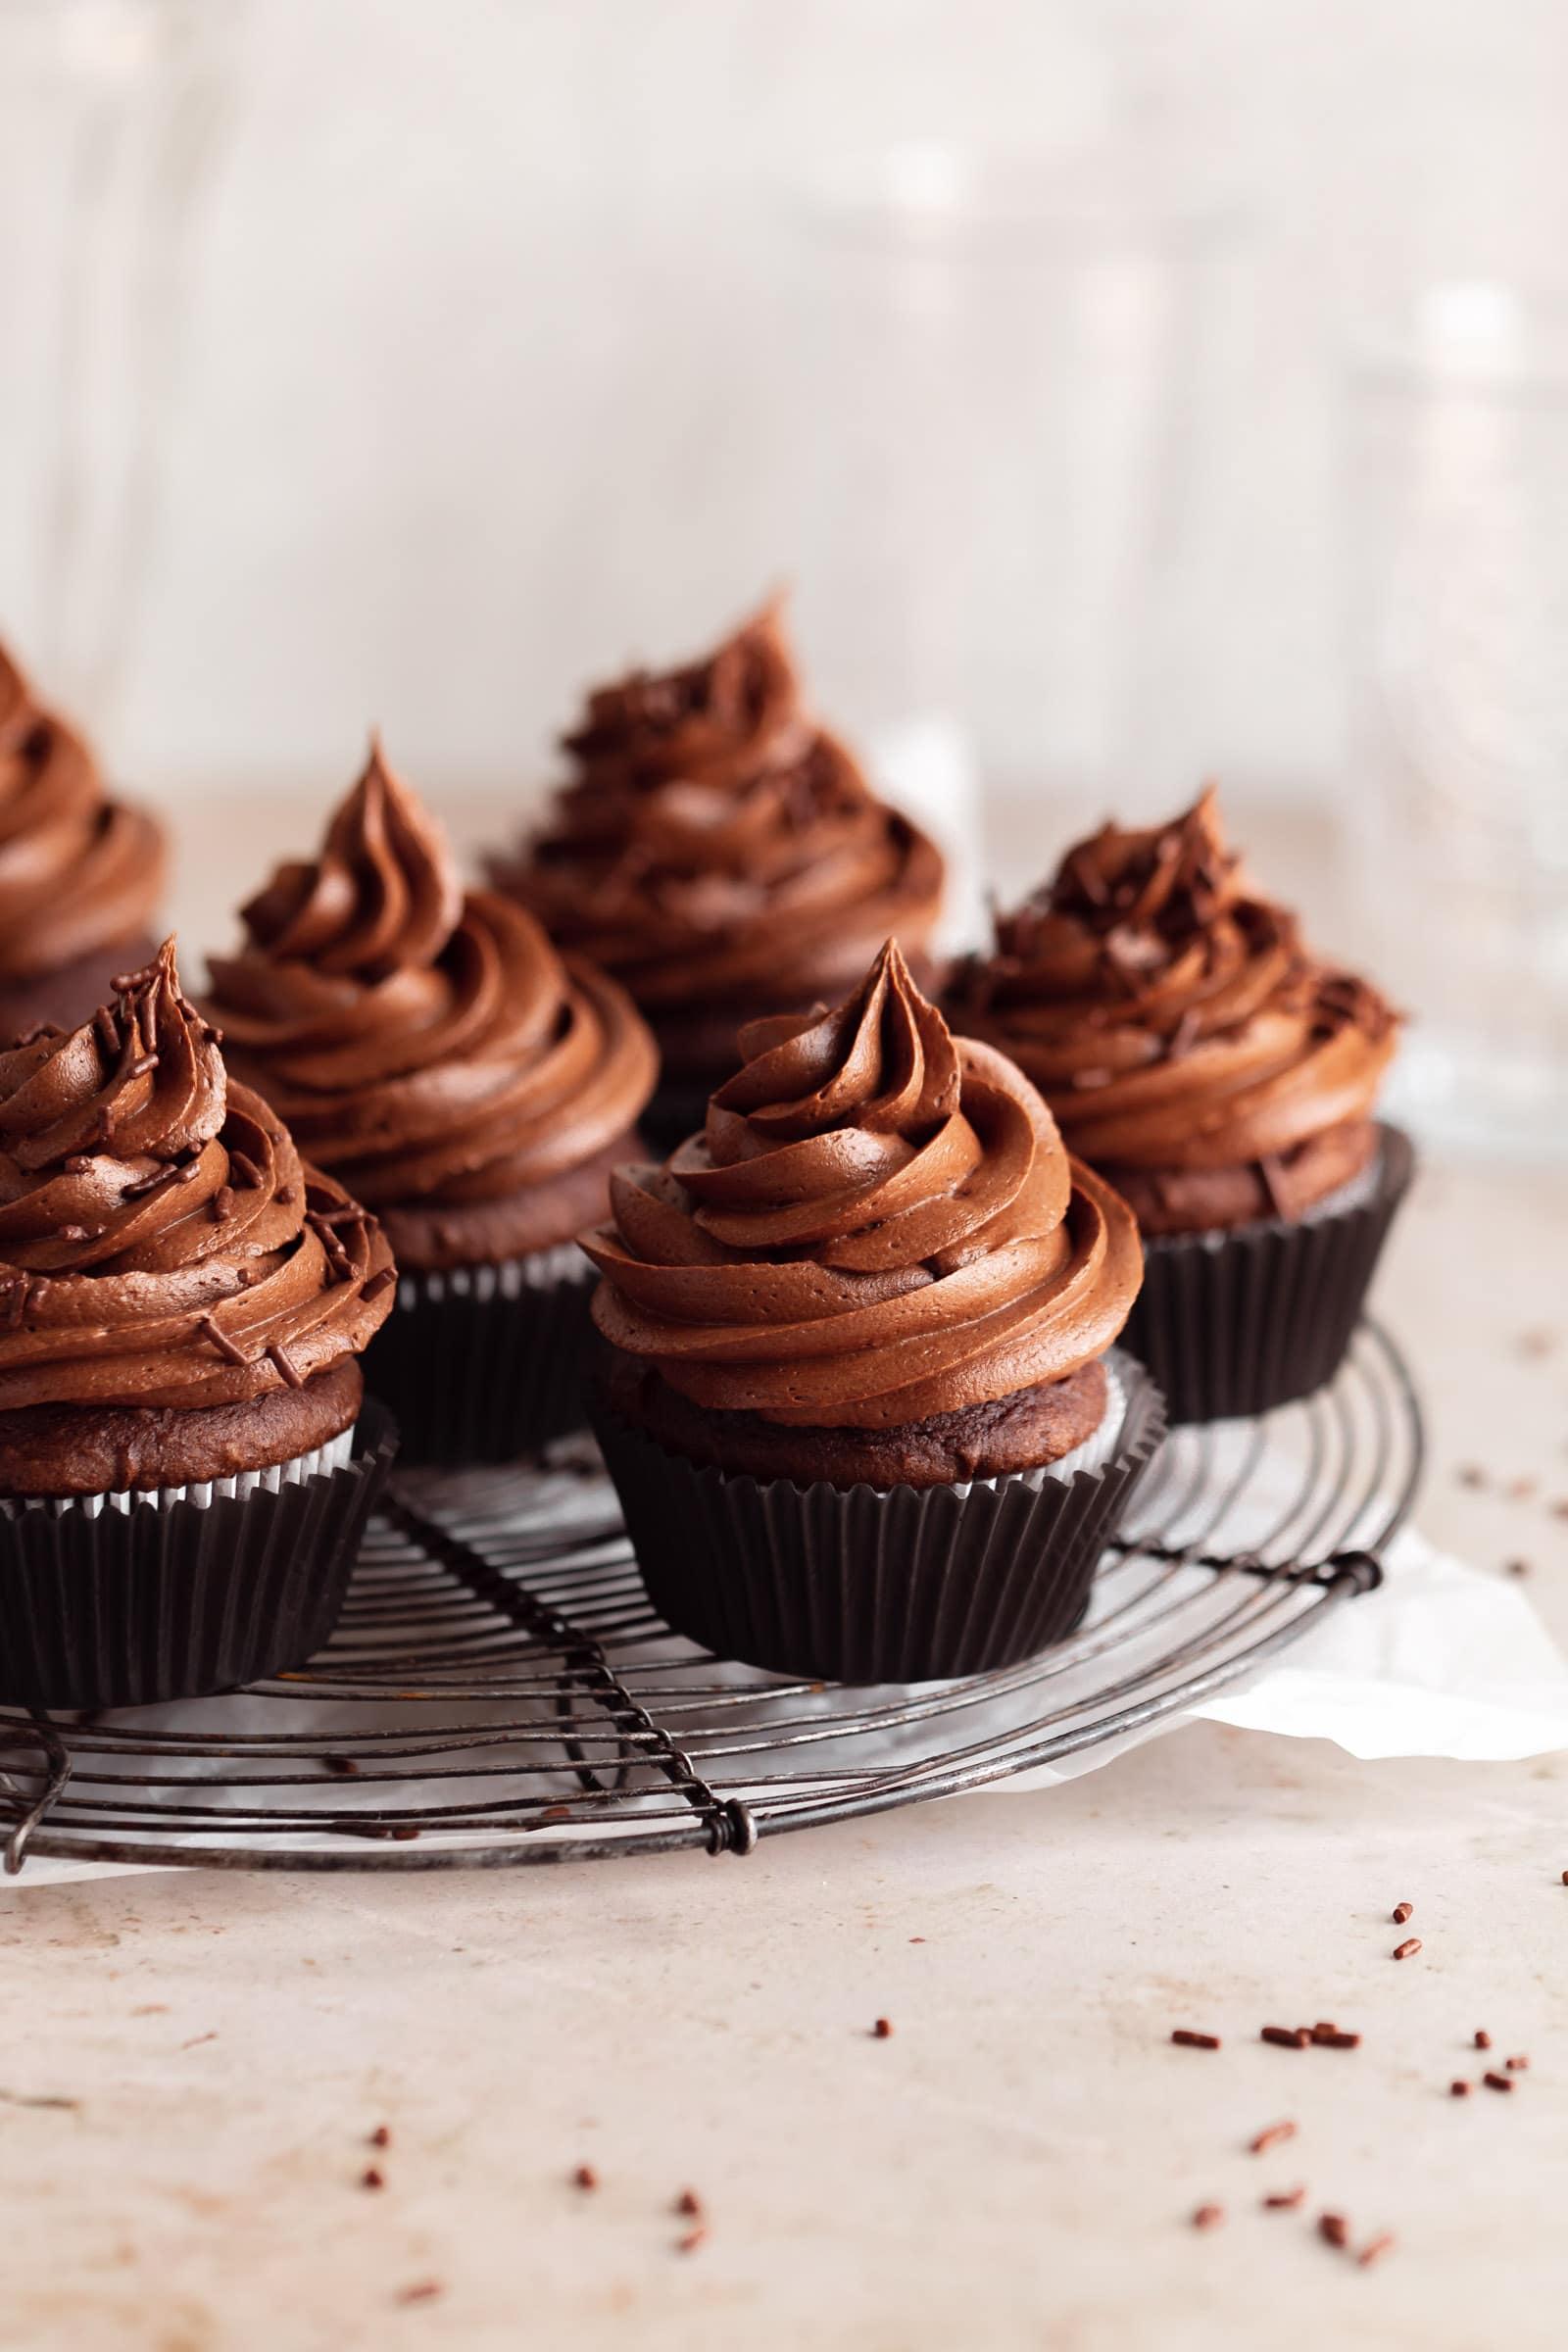 Perfect Chocolate Buttercream Broma Bakery